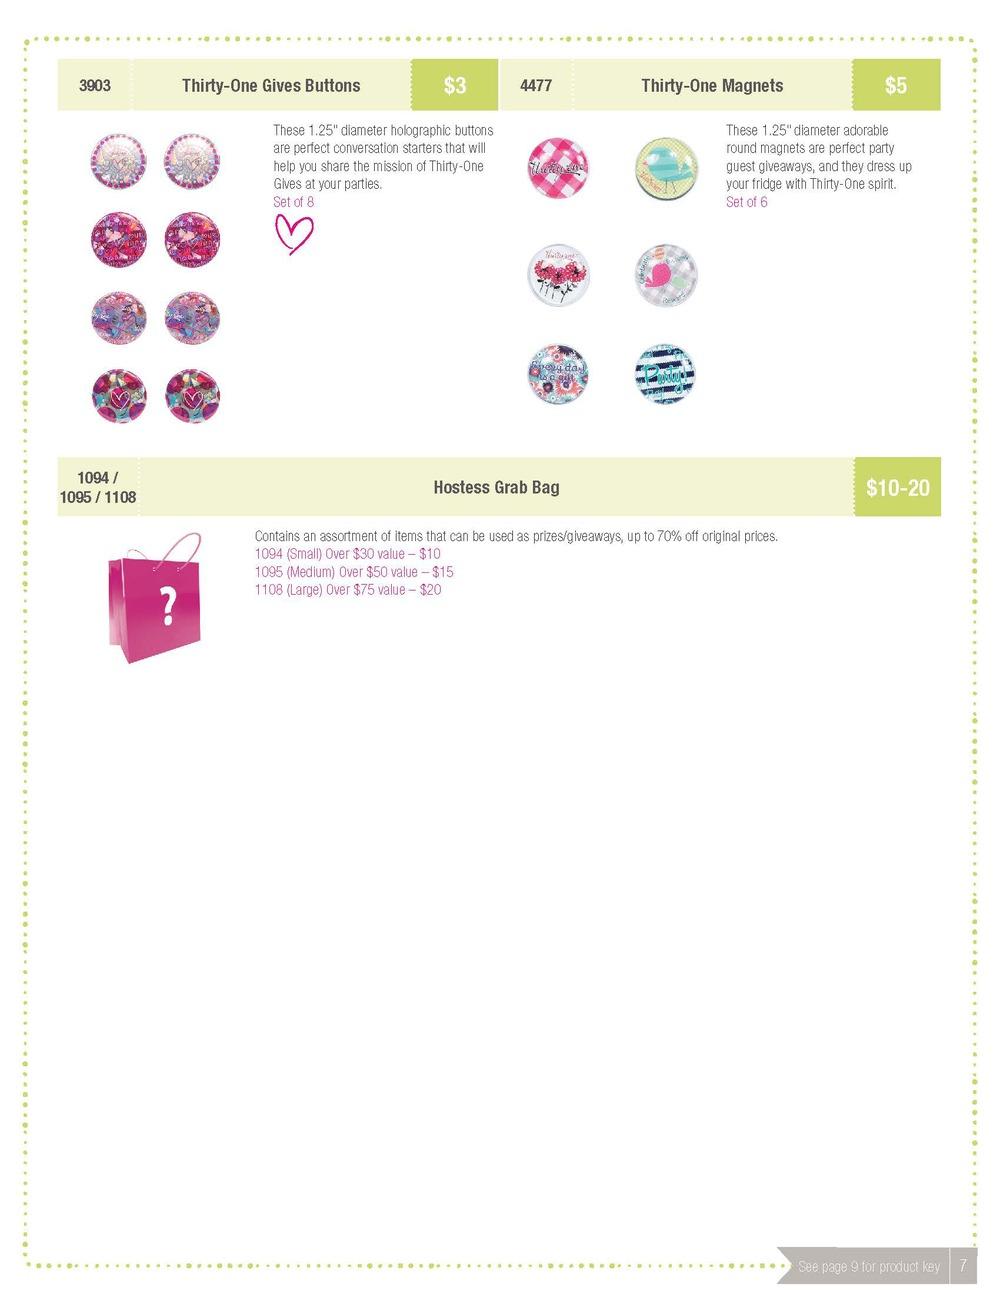 BS_14SU_ShoppingGuide_US_web_Page_7.jpg